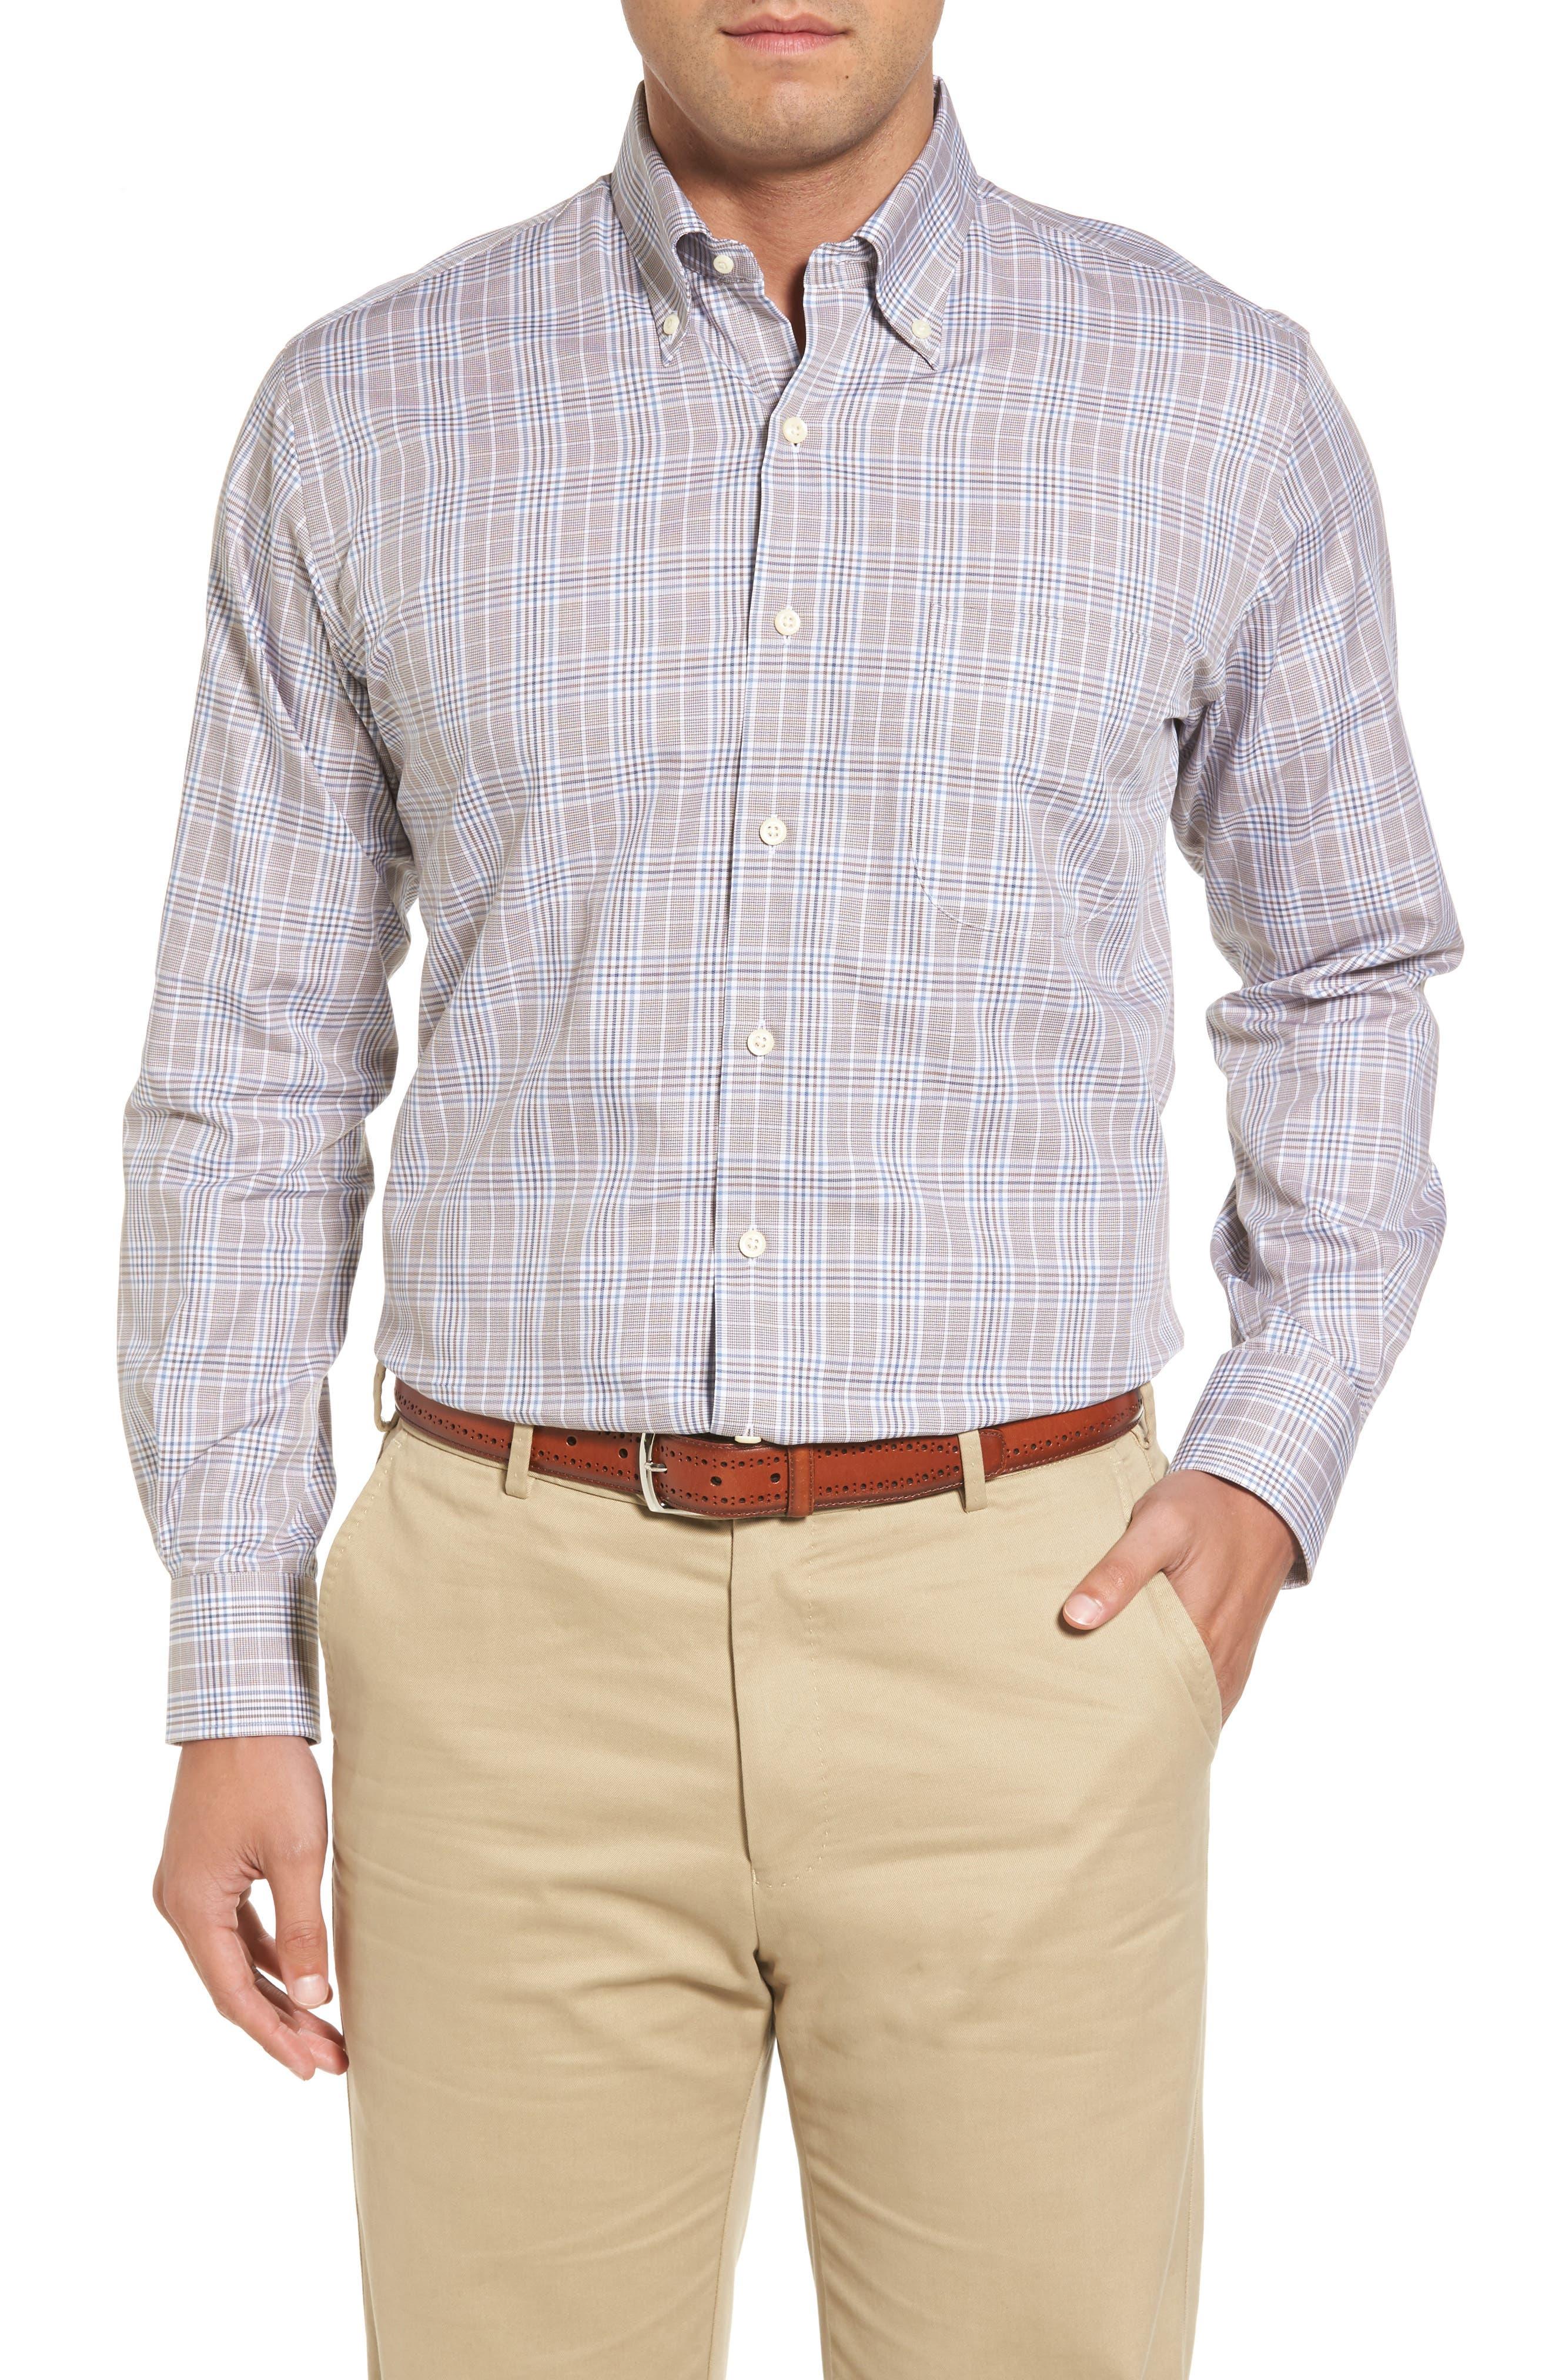 River Glen Plaid Regular Fit Sport Shirt,                             Main thumbnail 1, color,                             230